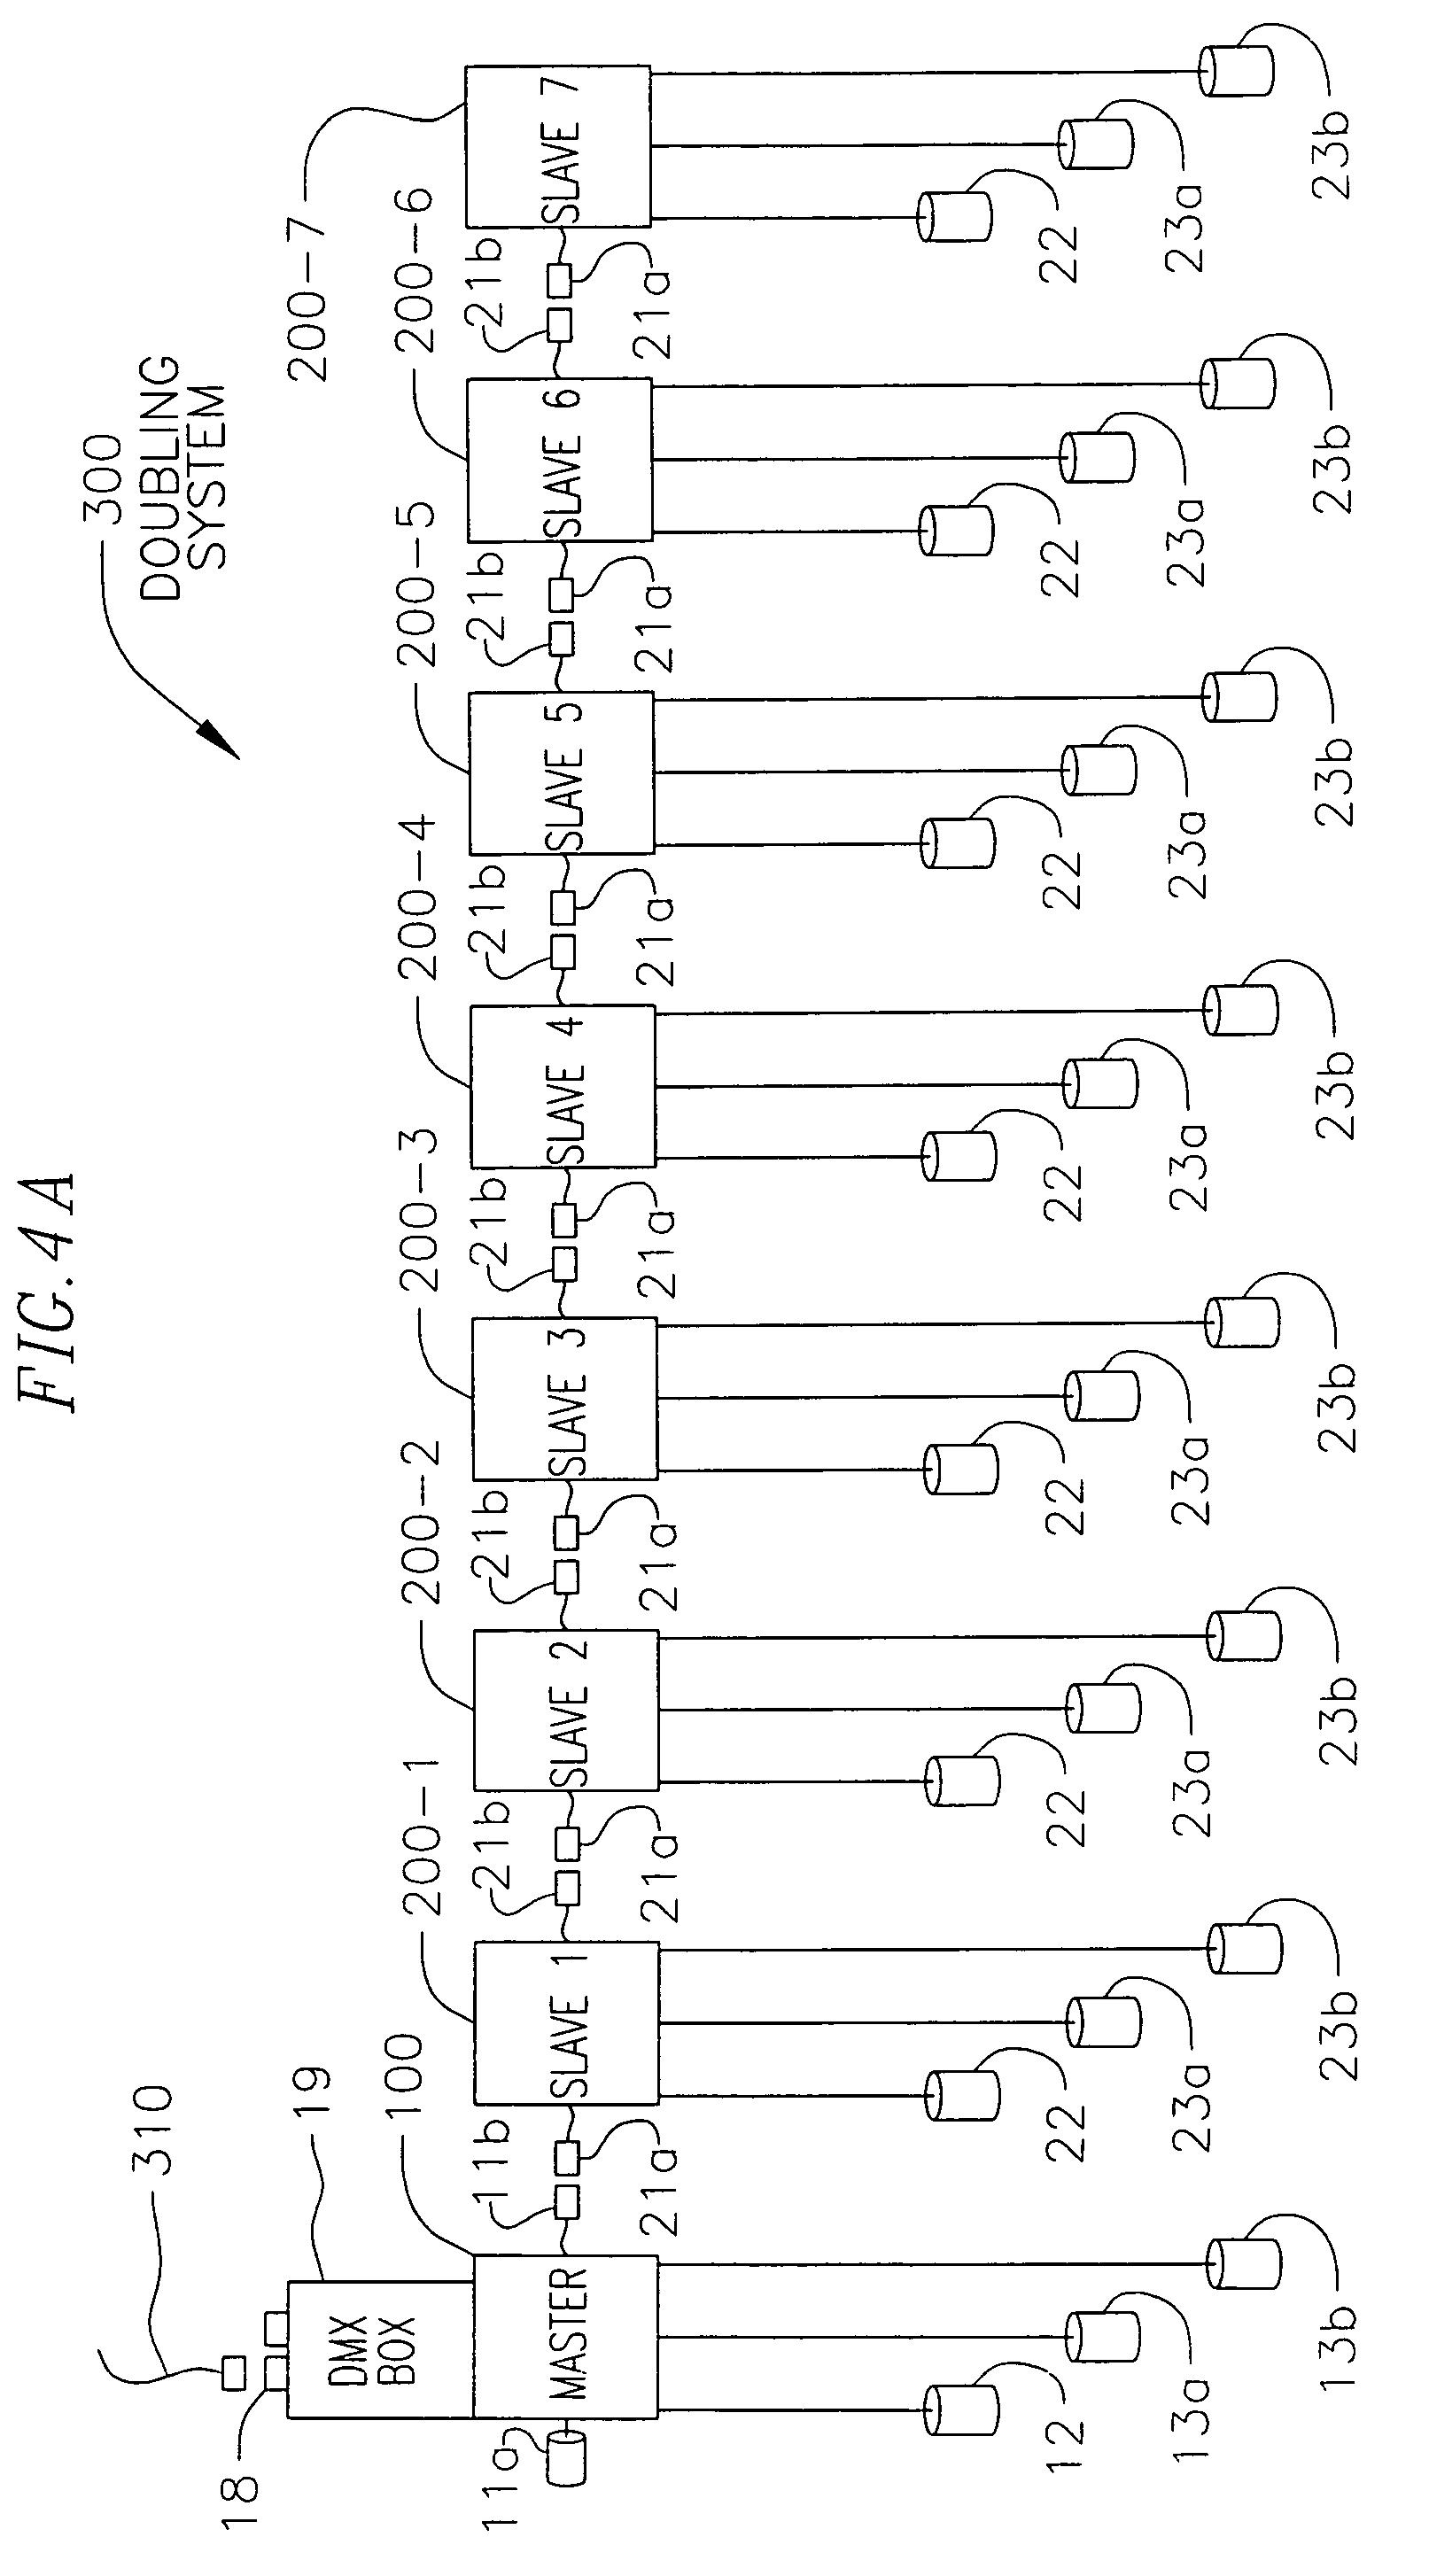 socapex wiring diagram